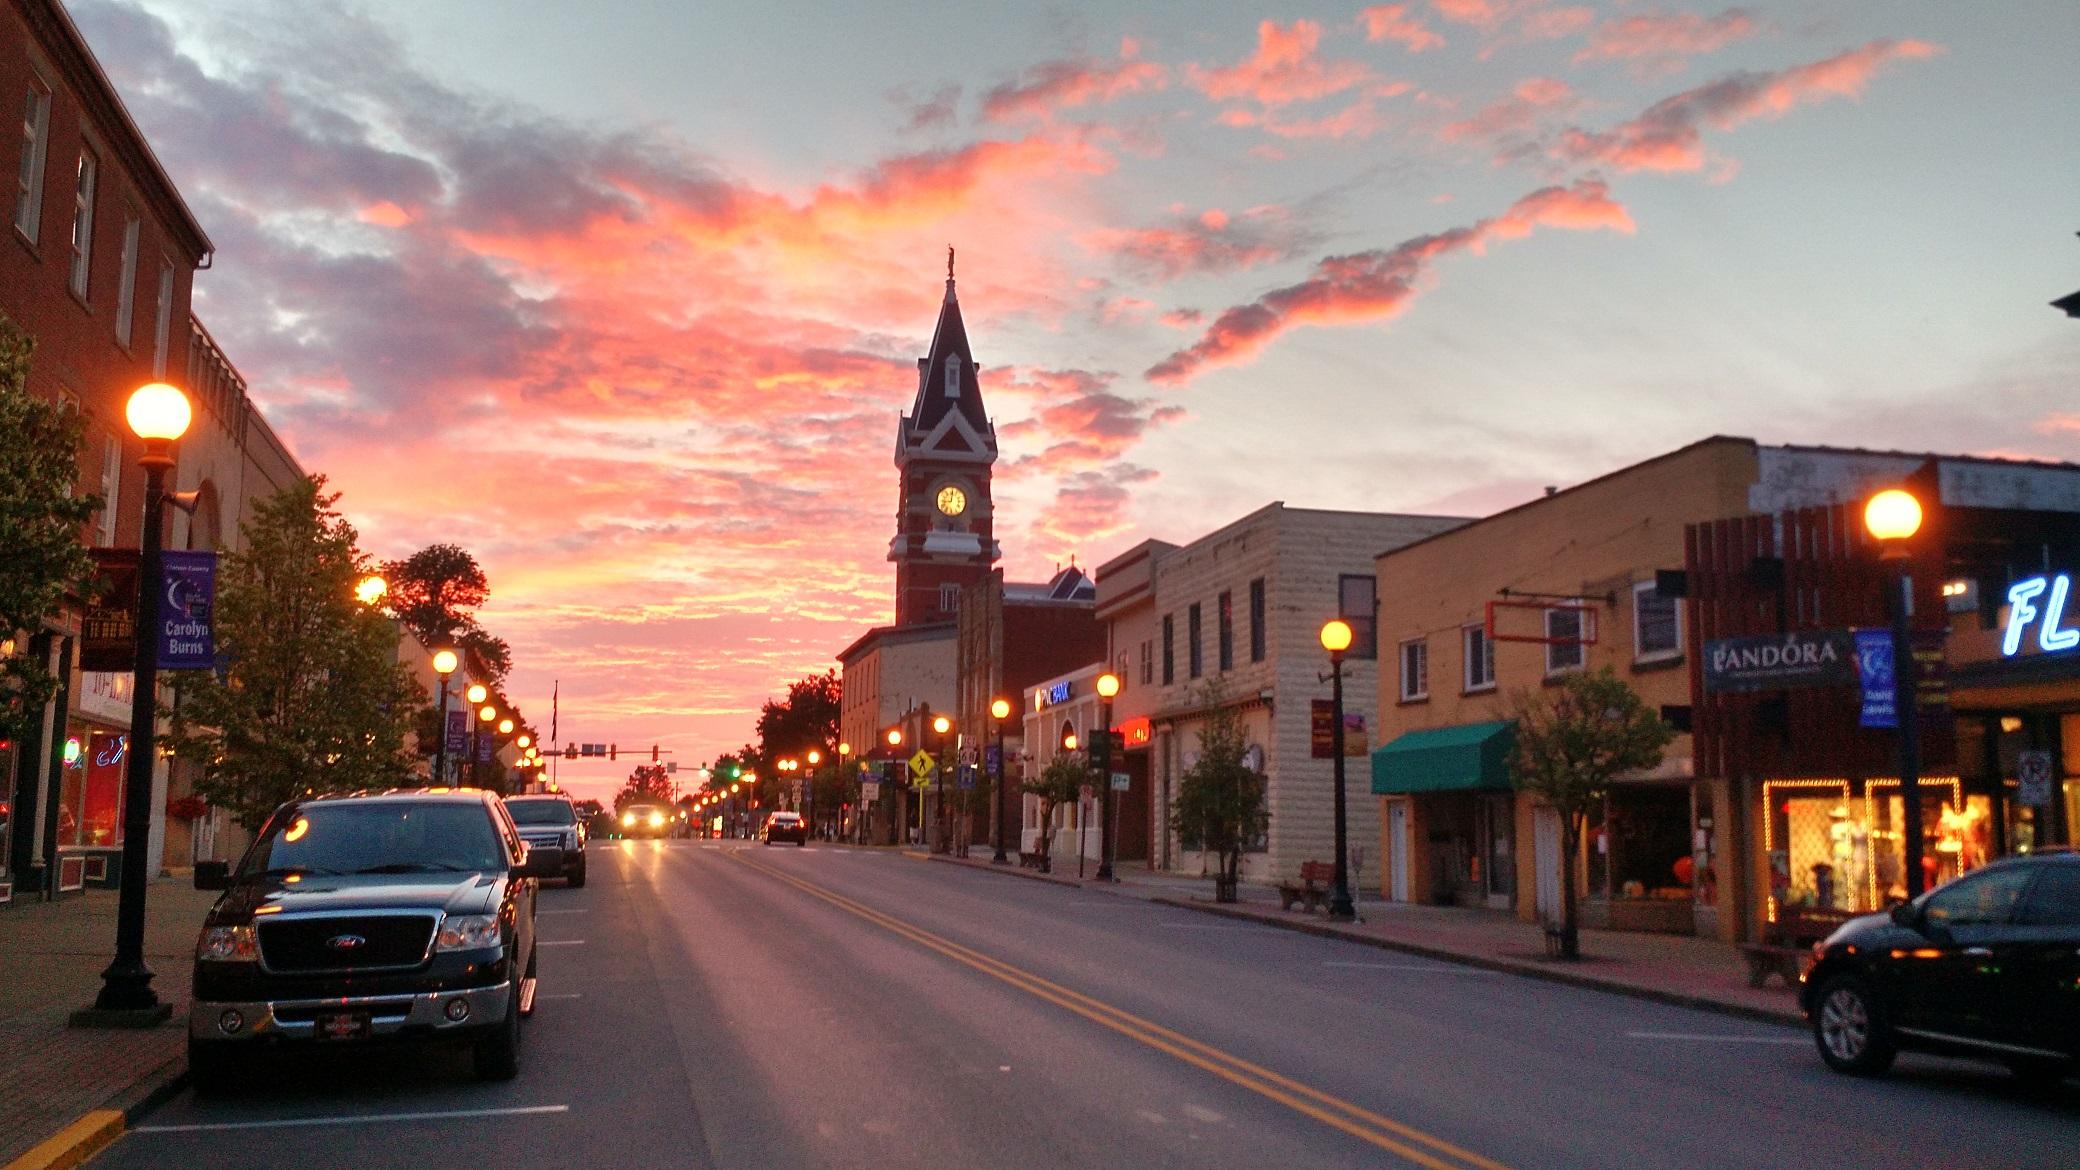 Clarion_main-street-sunset-2